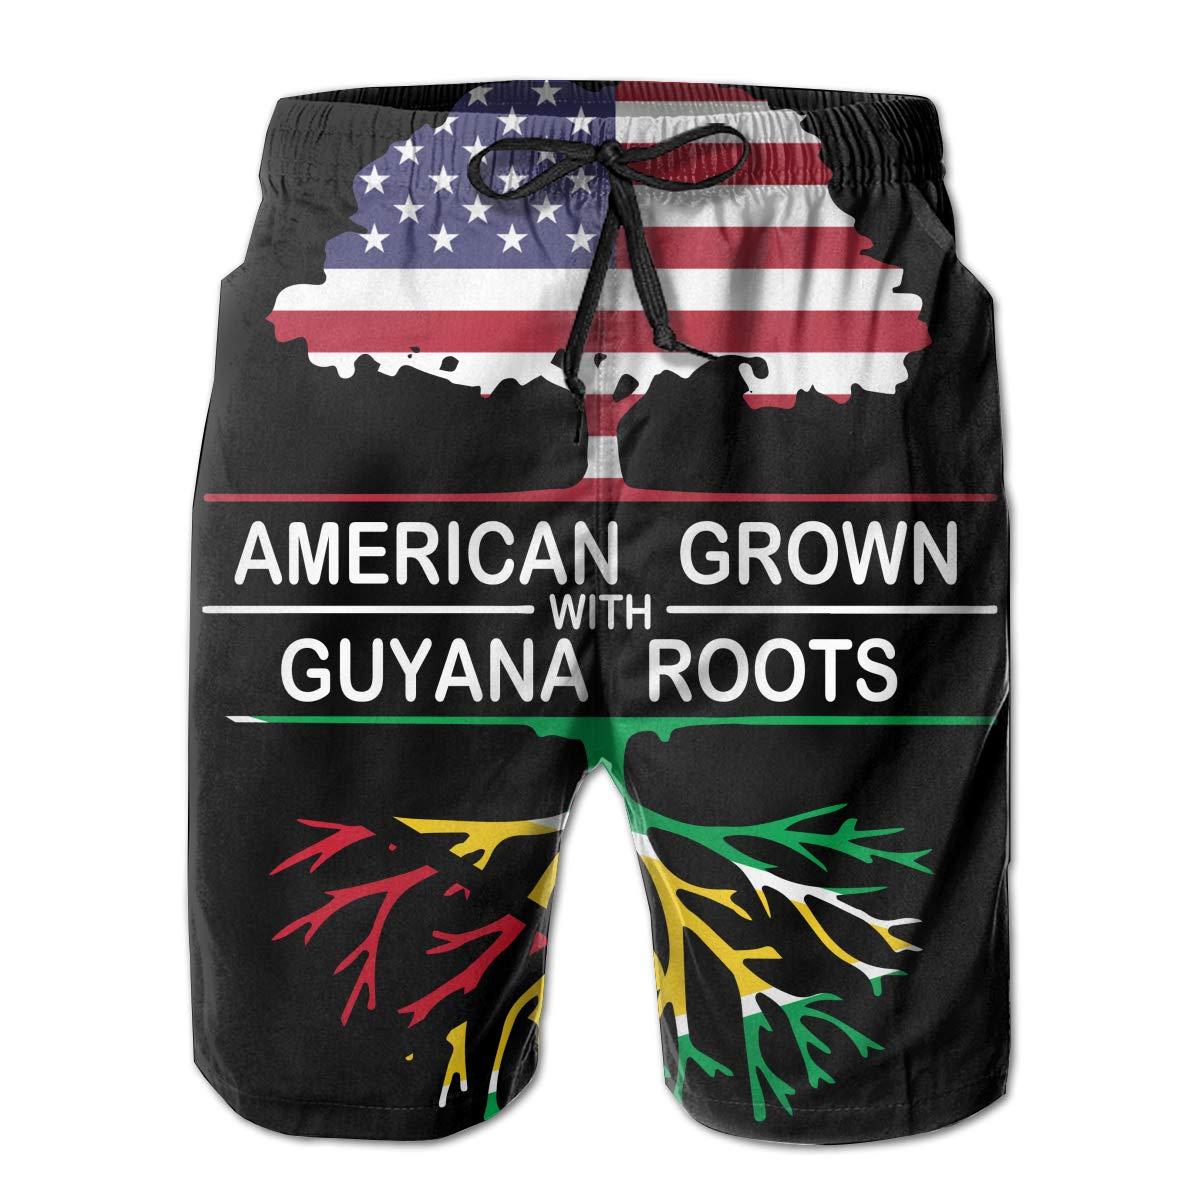 STDKNSK9 Mens American Grown with Guyana Roots-1 Board Shorts Beach Pants